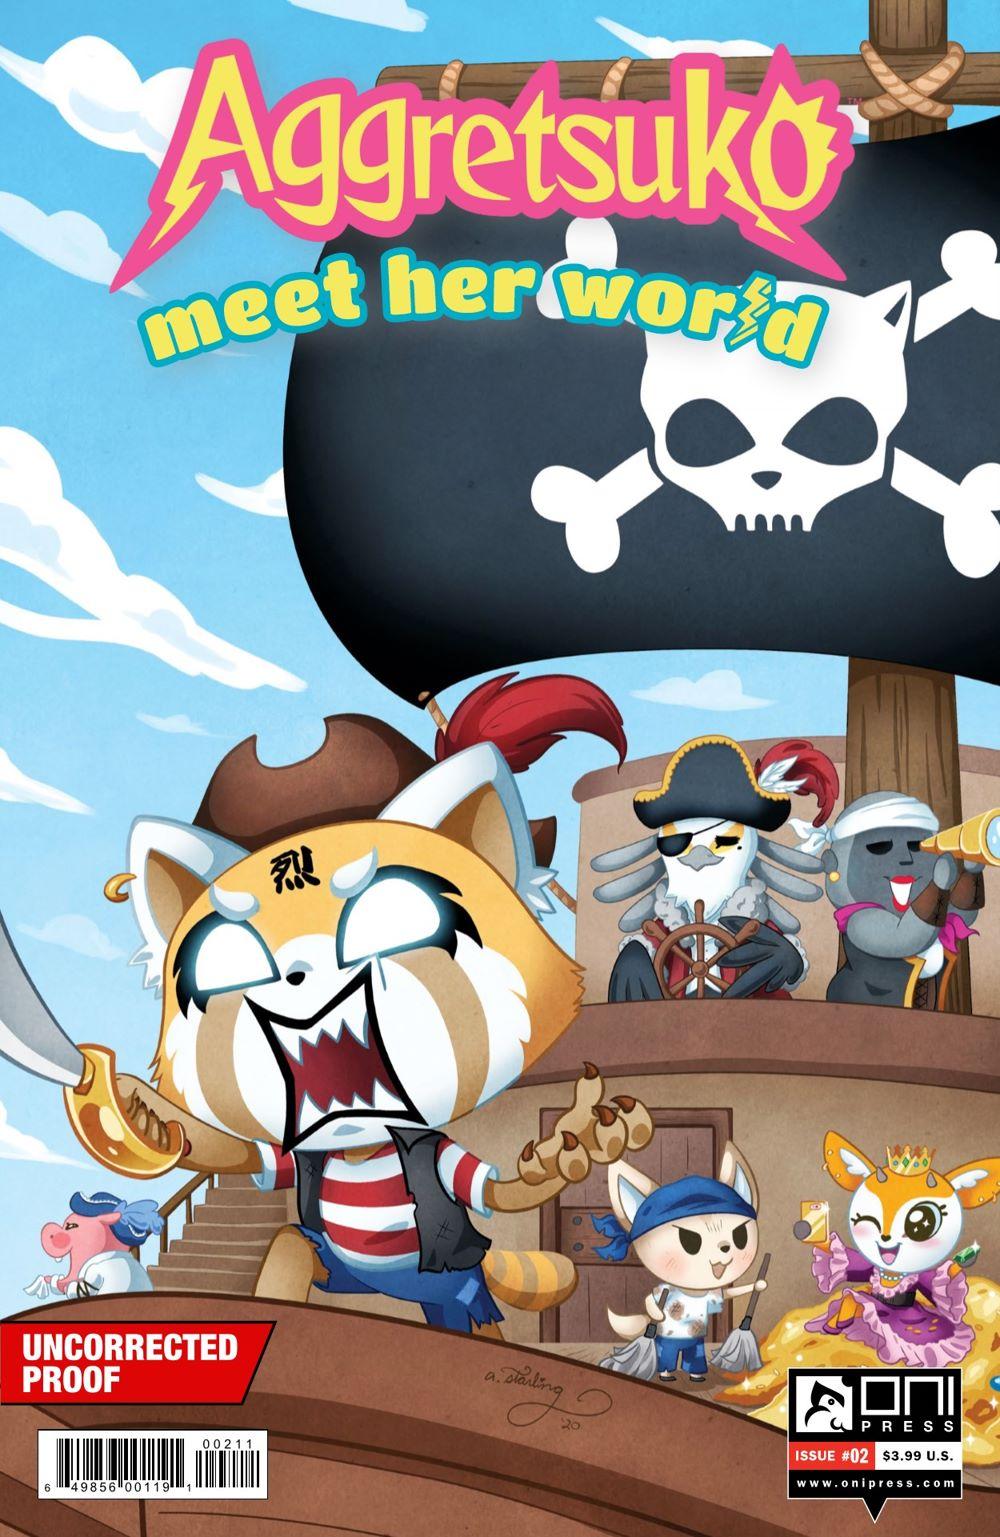 AGGRETSUKO-MHW-2-MARKETING-01-1 ComicList Previews: AGGRETSUKO MEET HER WORLD #2